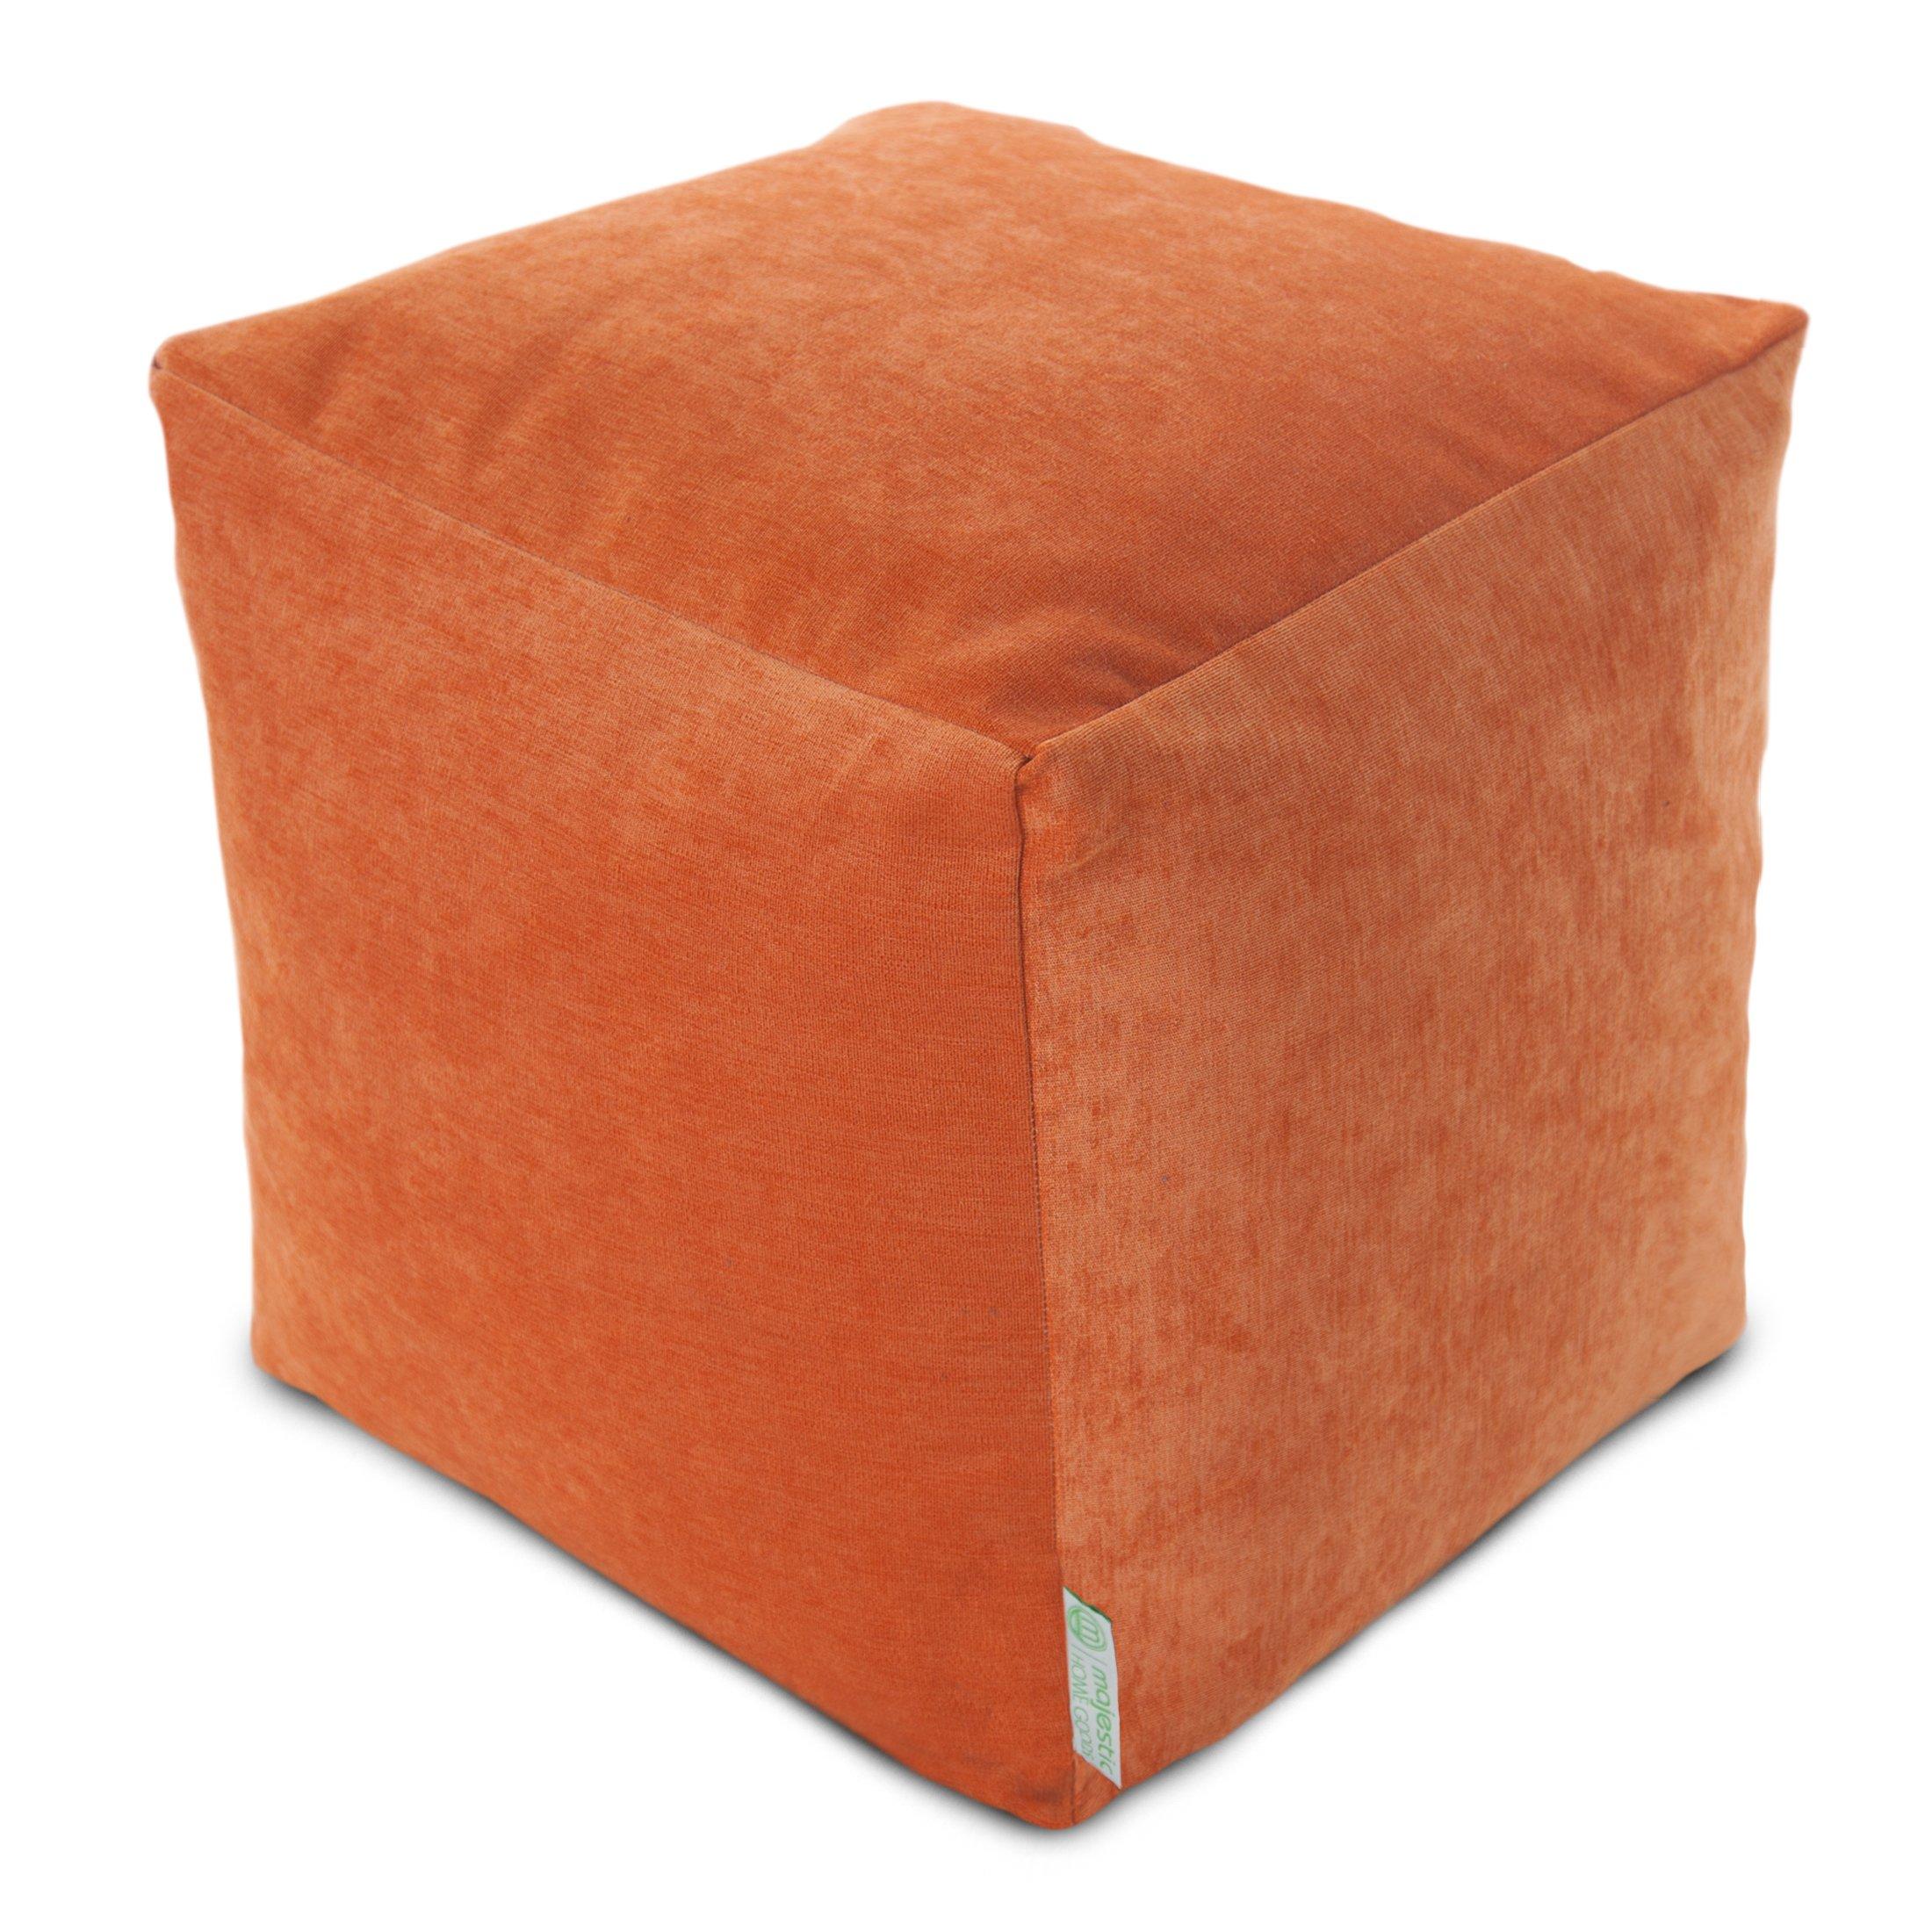 Majestic Home Goods Orange Villa Indoor Bean Bag Ottoman Pouf Cube 17'' L x 17'' W x 17'' H